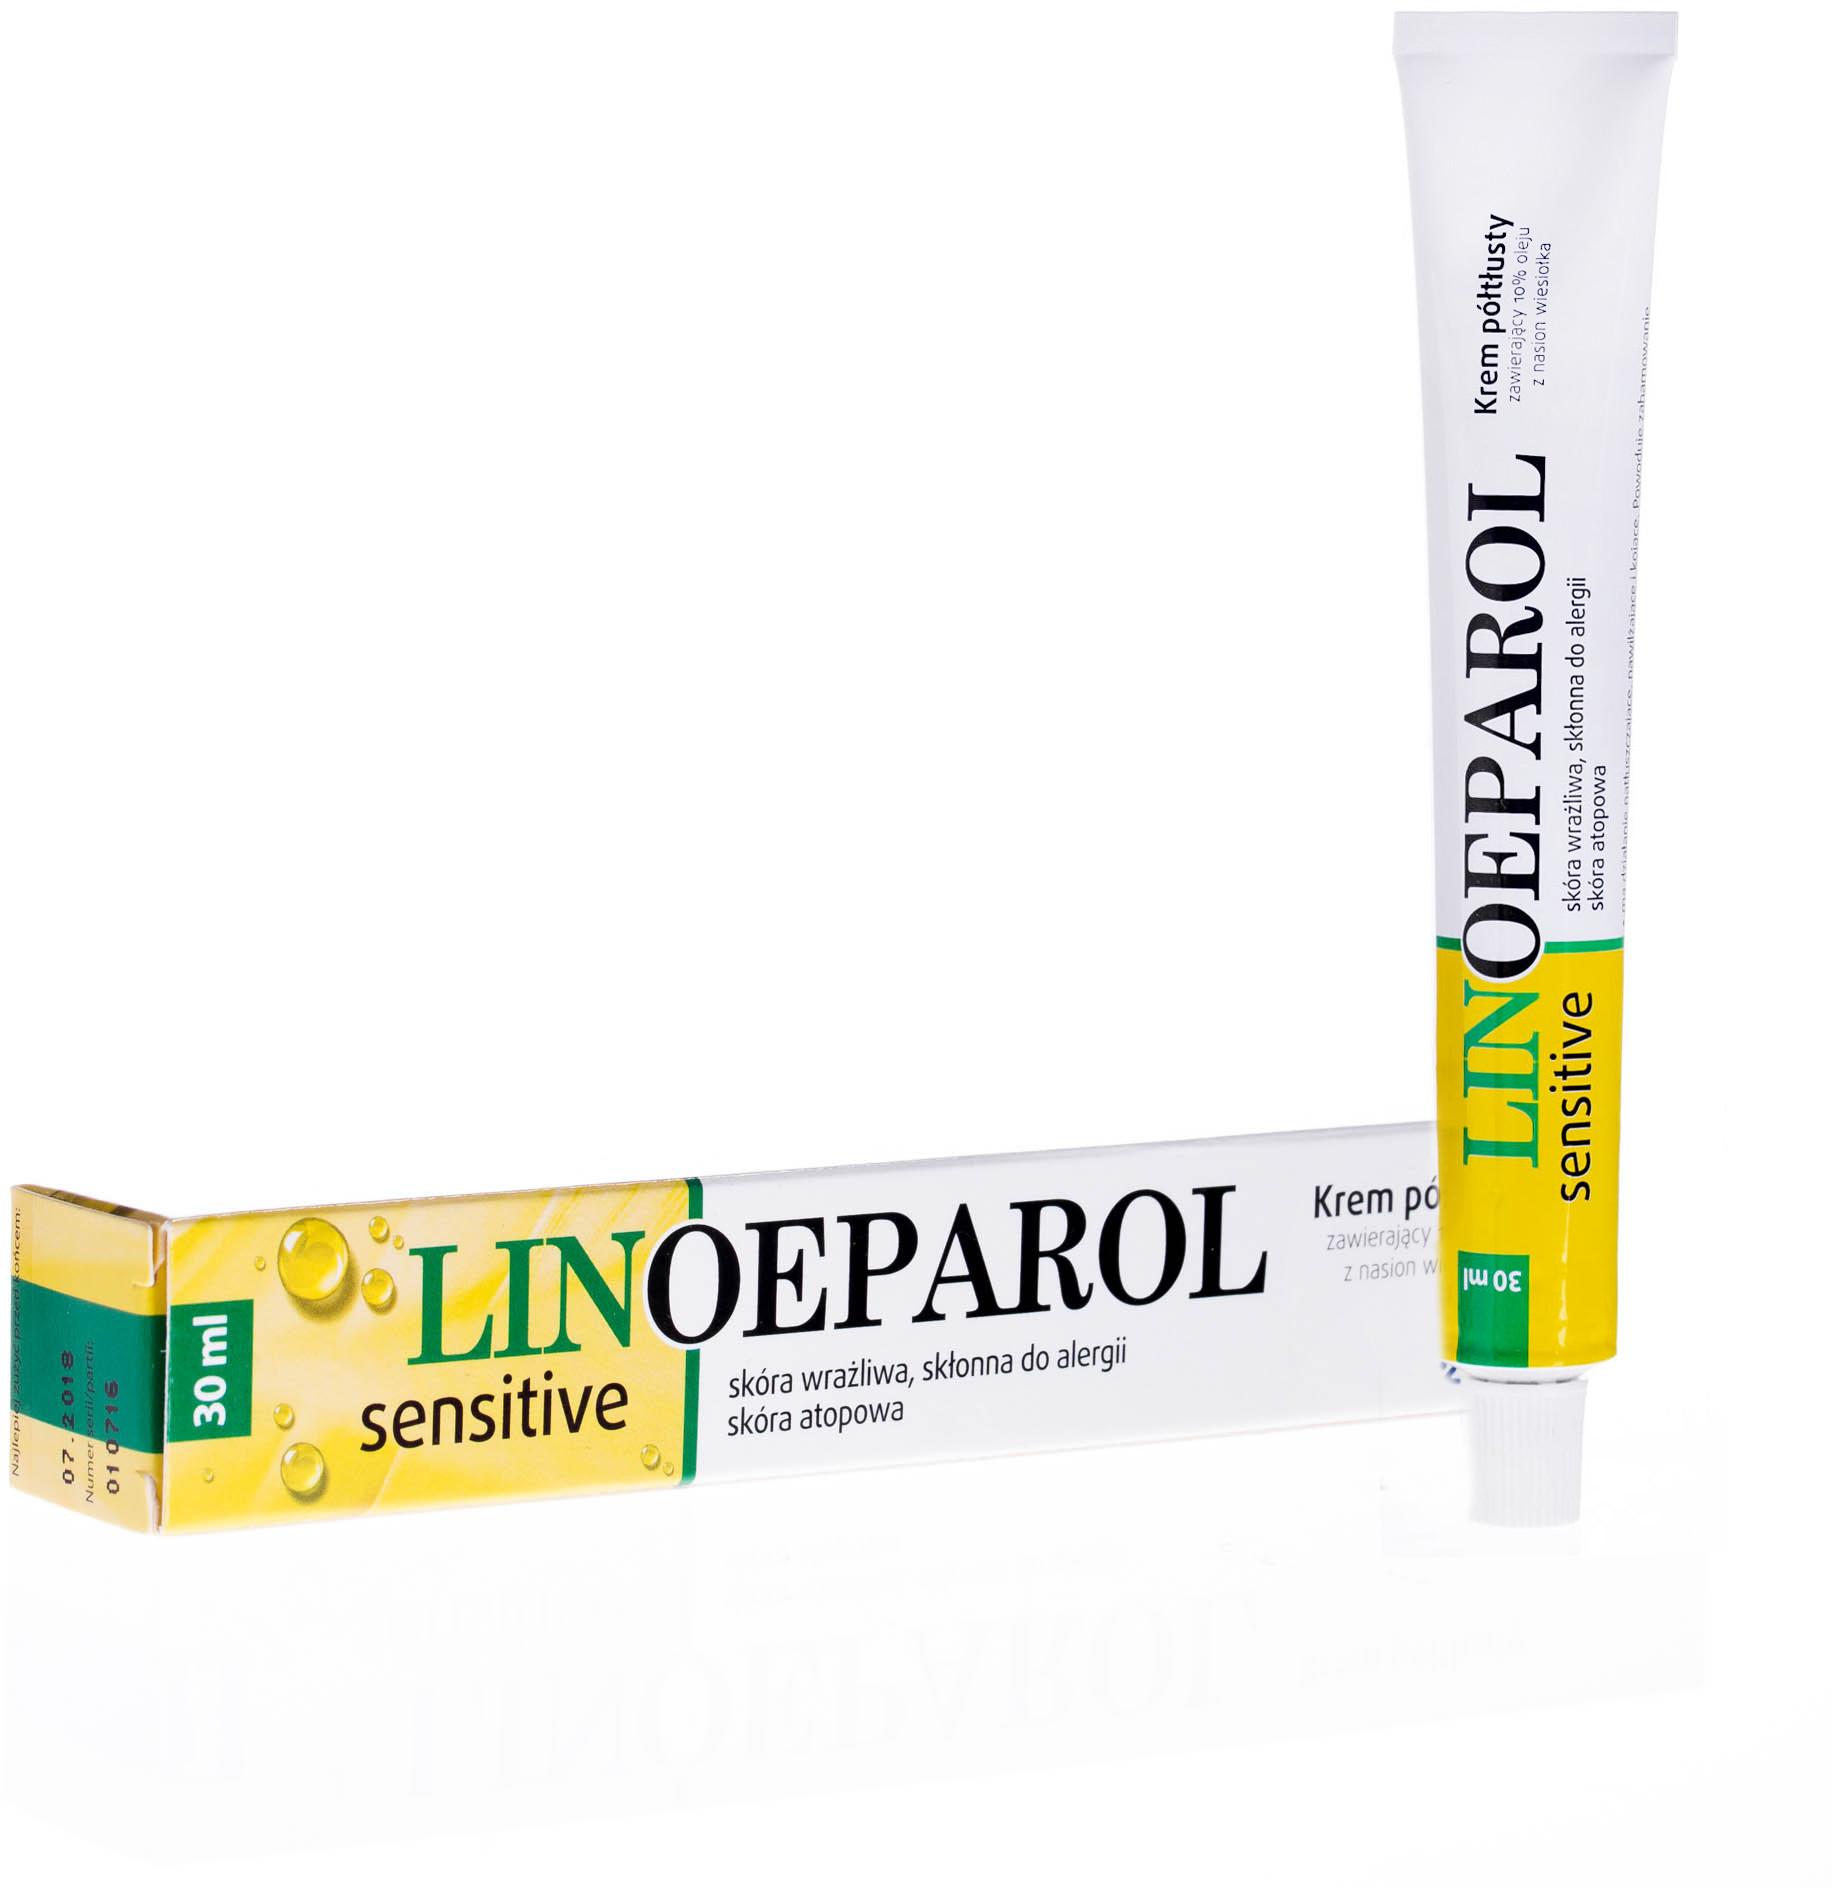 Adamed LINOEPAROL Sensitive Krem 30ml